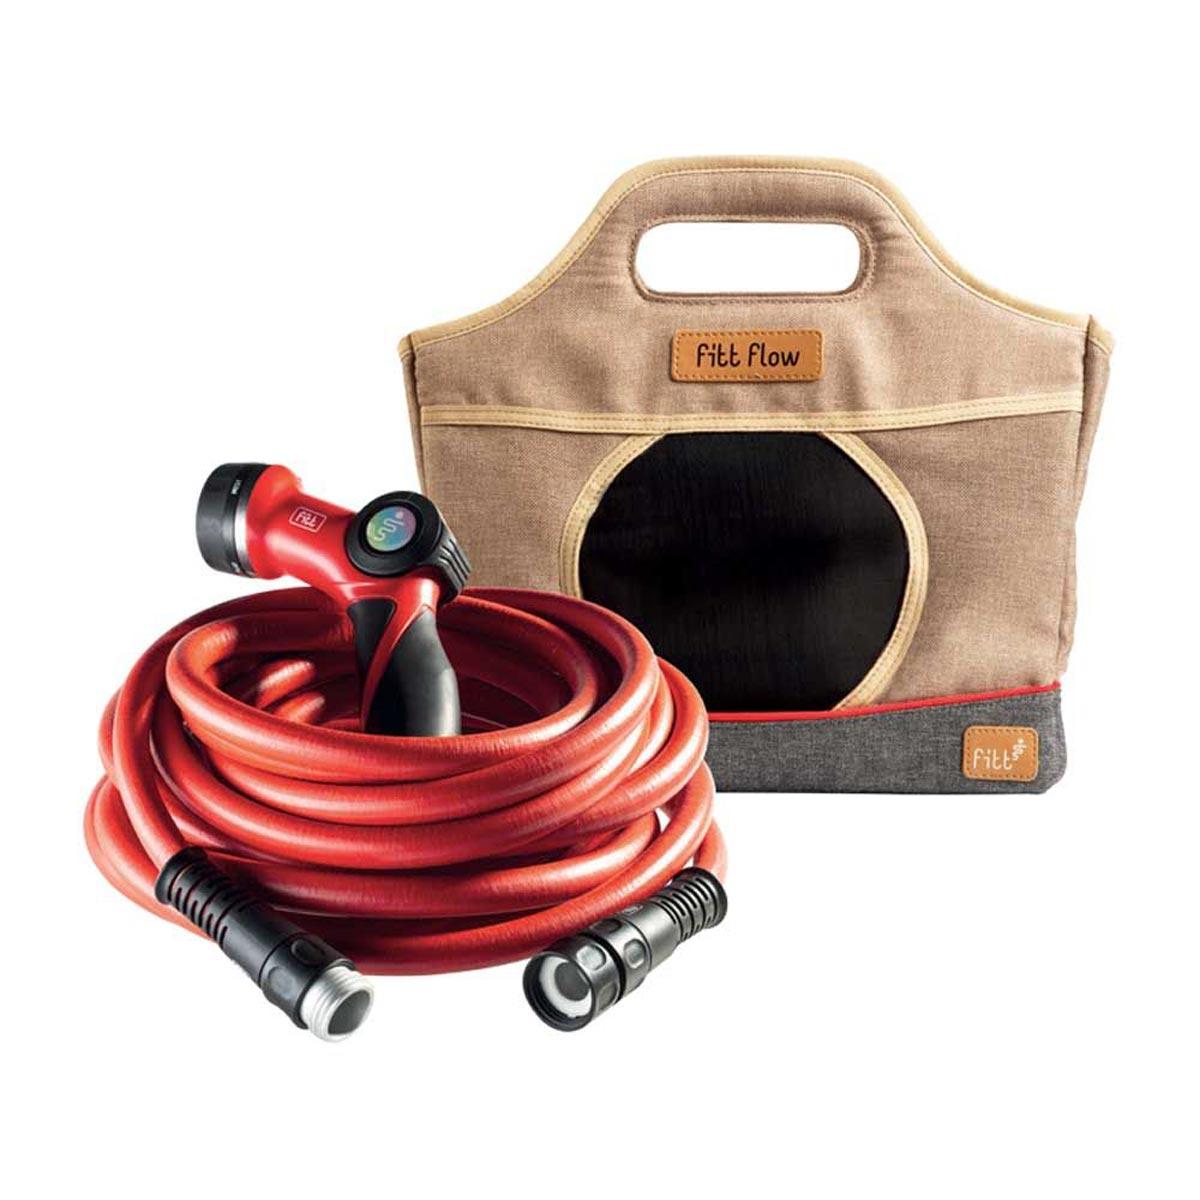 FITT Flow 1/2 in. x 60 ft. Light Duty Lightweight Water Hose Kit with Hose / Multi-Pattern Spray Nozzle / Storage Bag